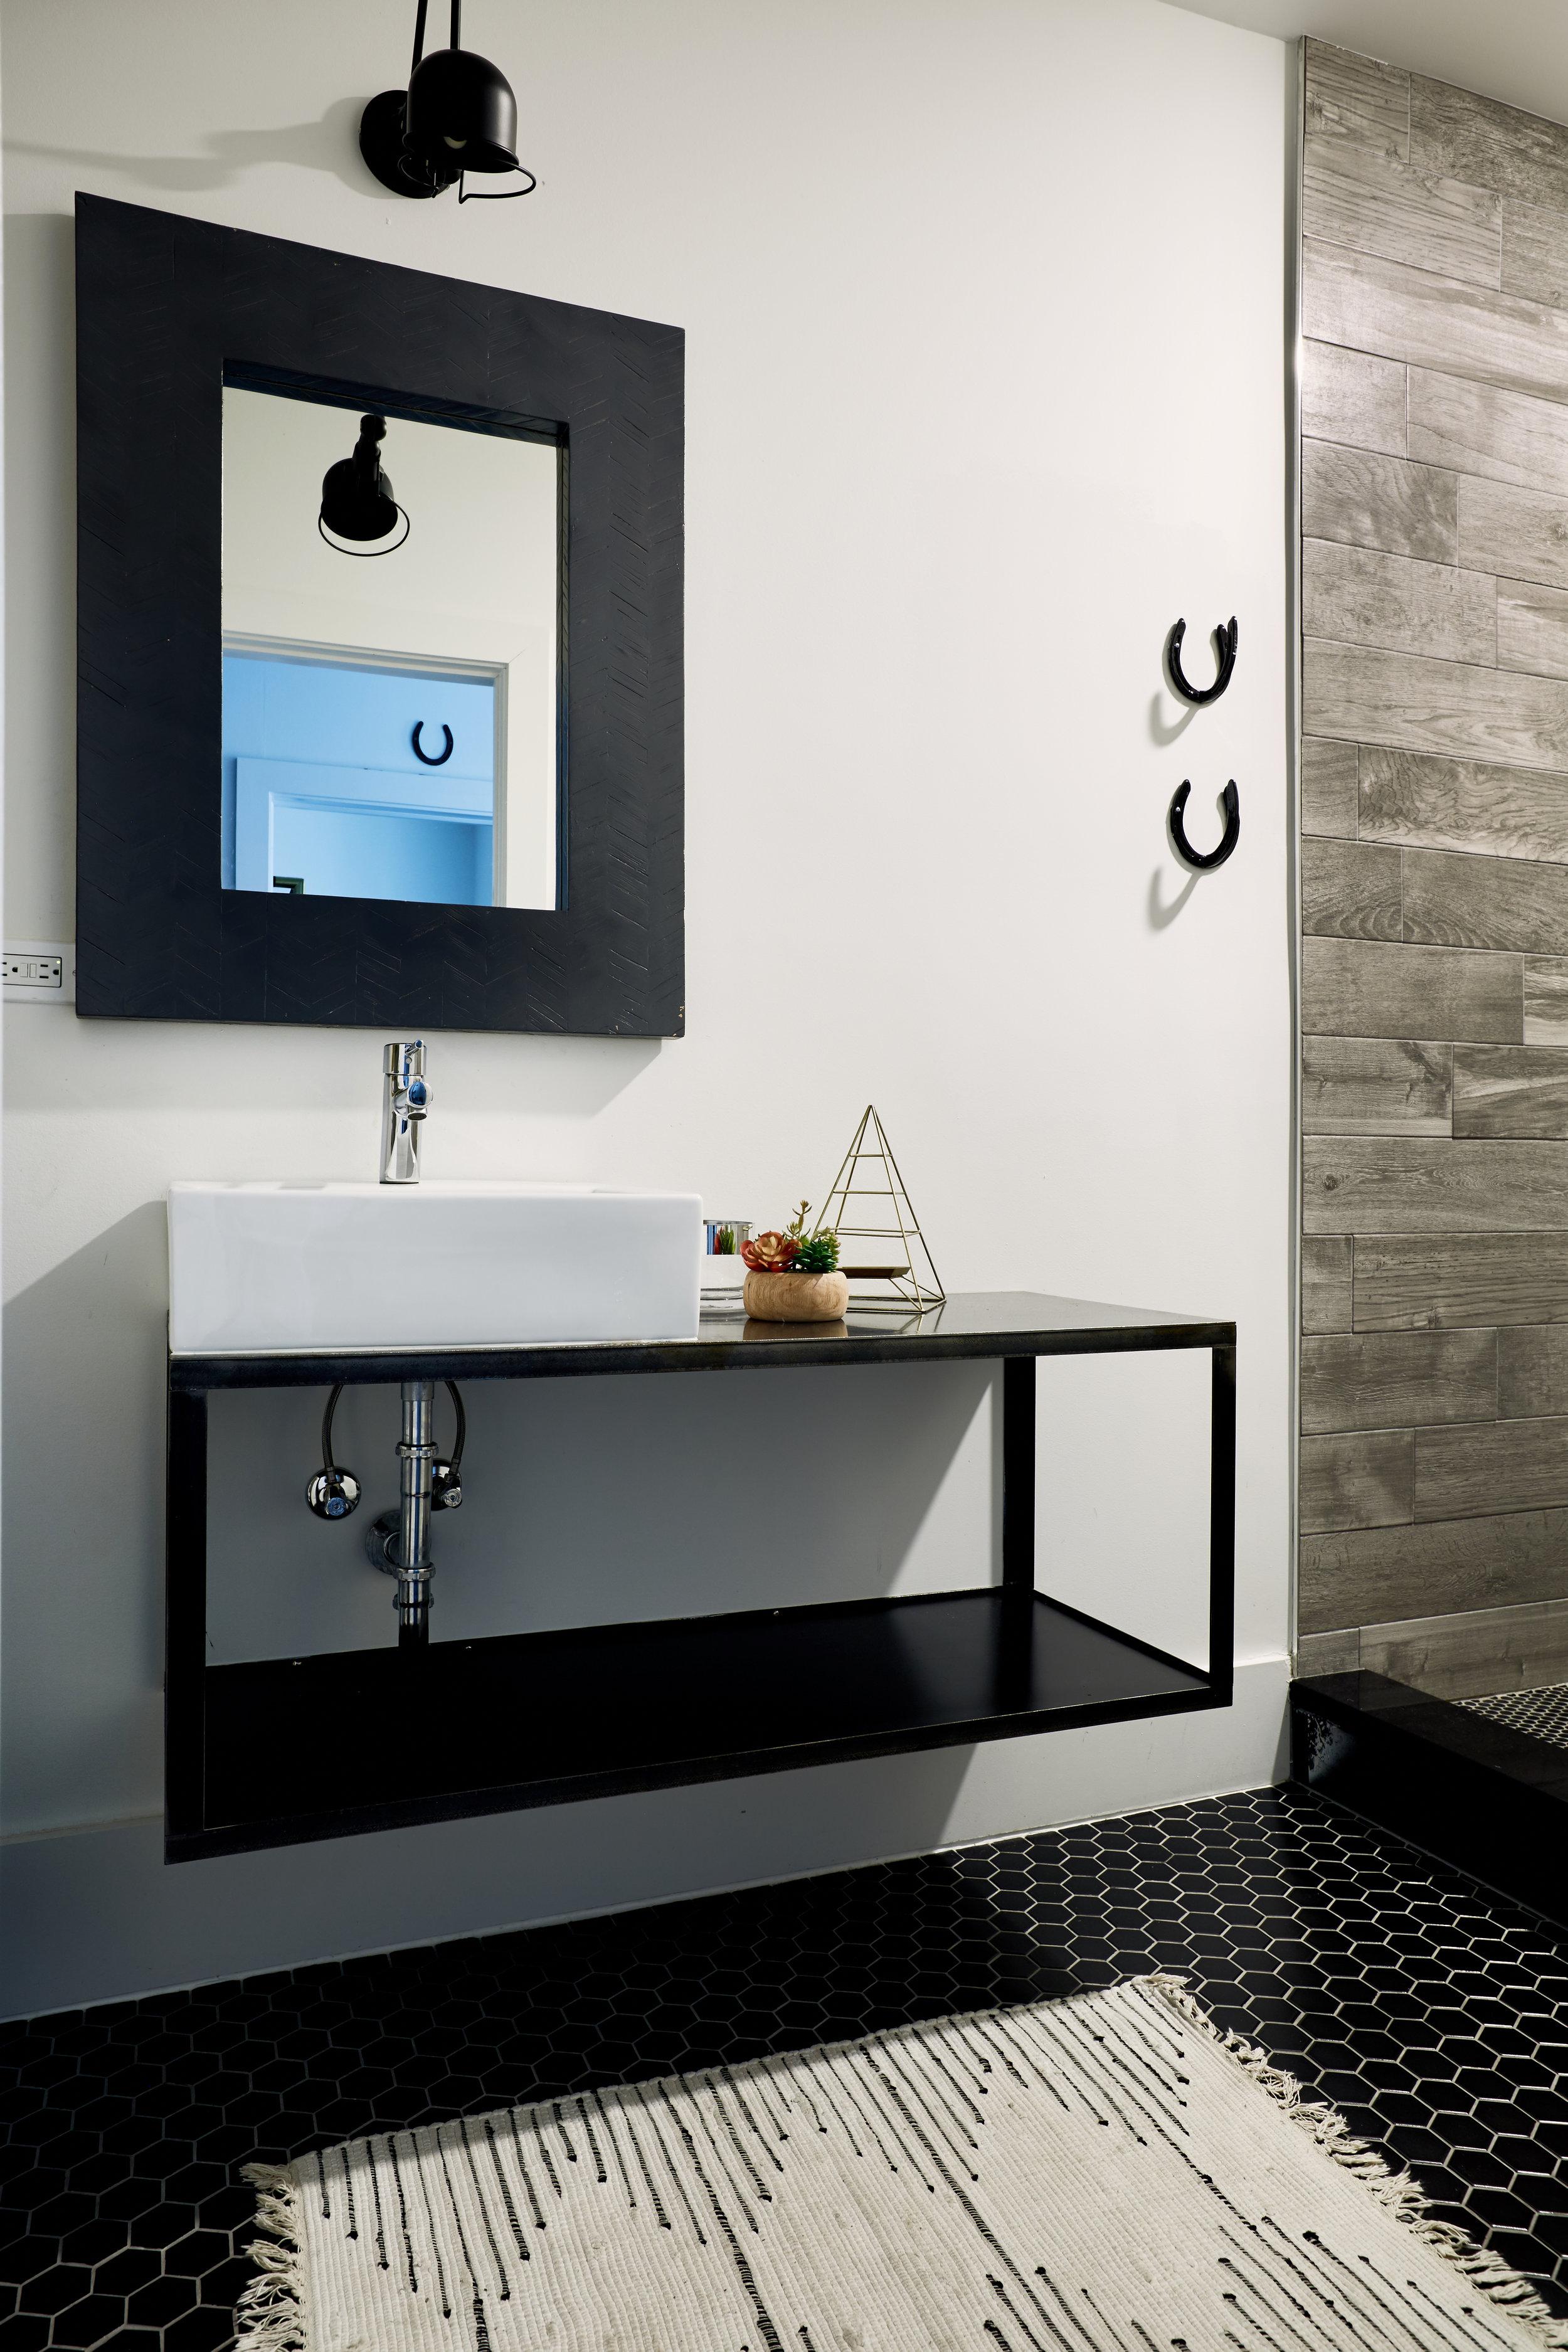 El_Motel_Bathroom_895.jpg